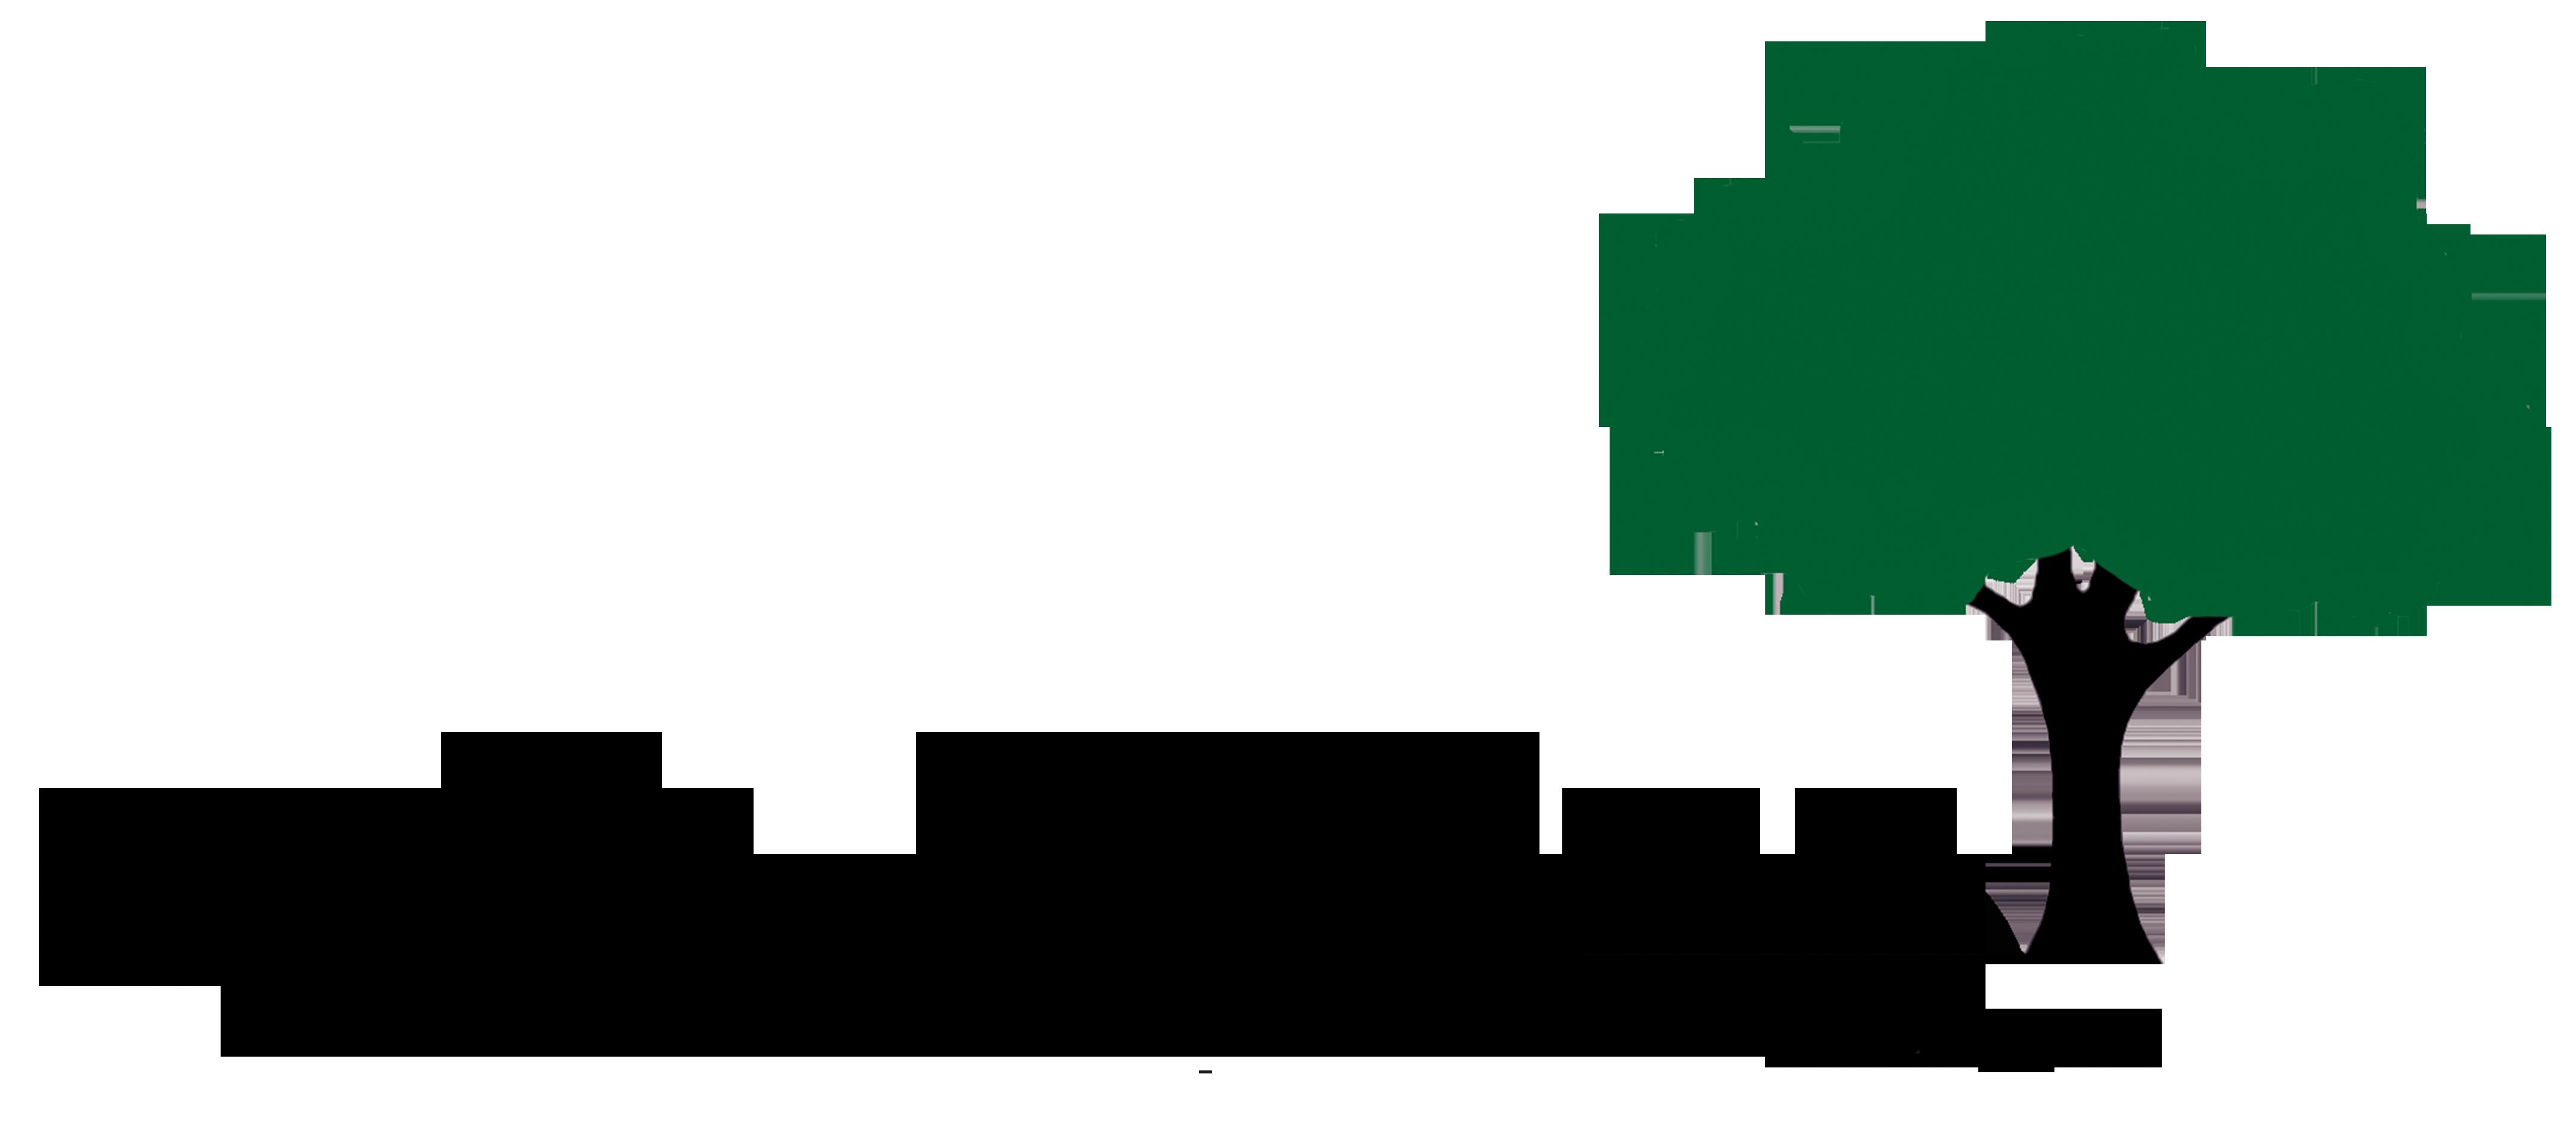 galadekor - Exklusives Raumdesign-Logo